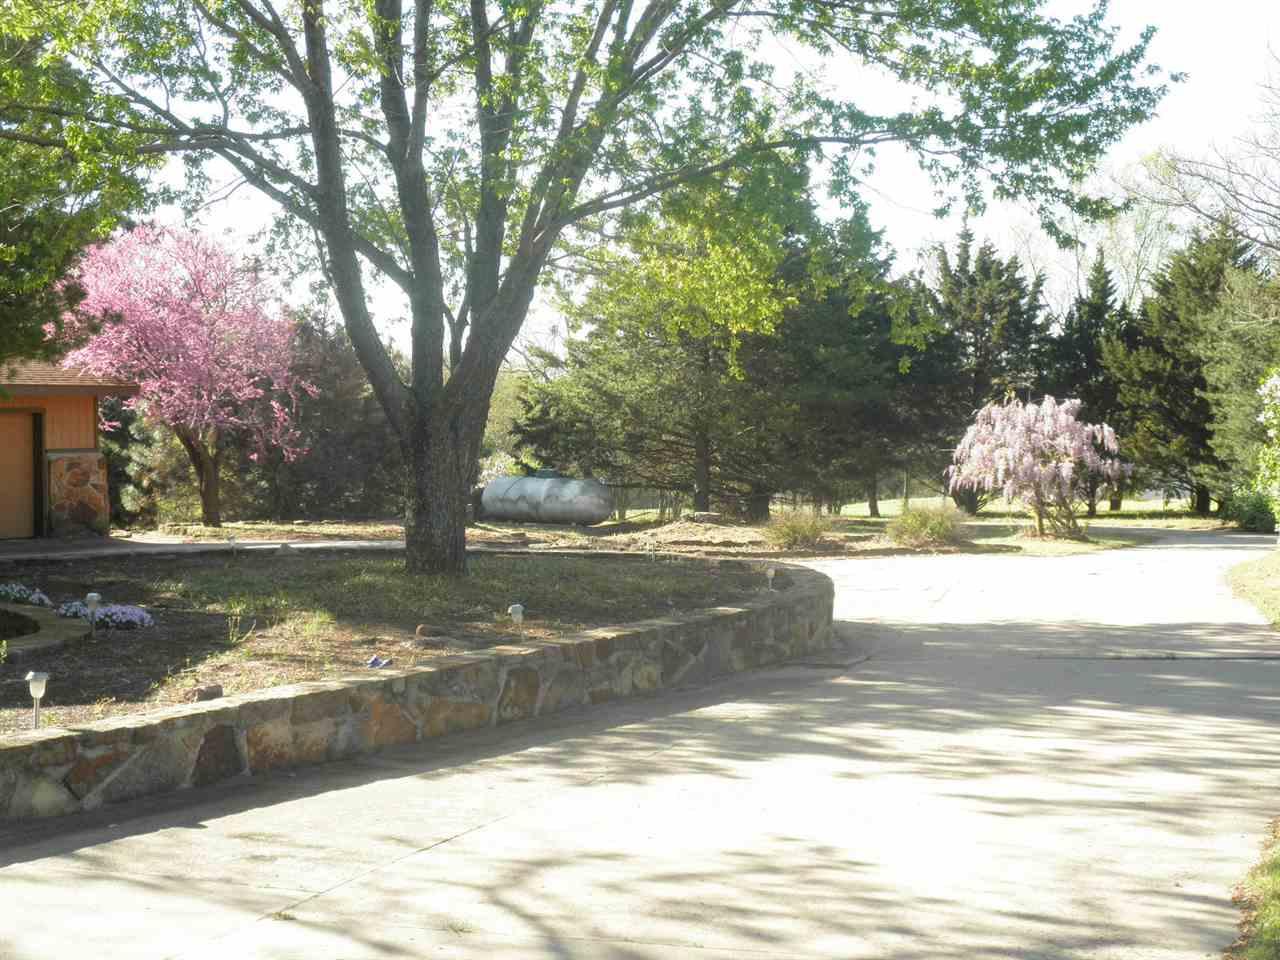 #century21groupone, #homesforsaleponcacity, #poncacityrealestate | 5317 Hunt Road Ponca City, OK 74604 2